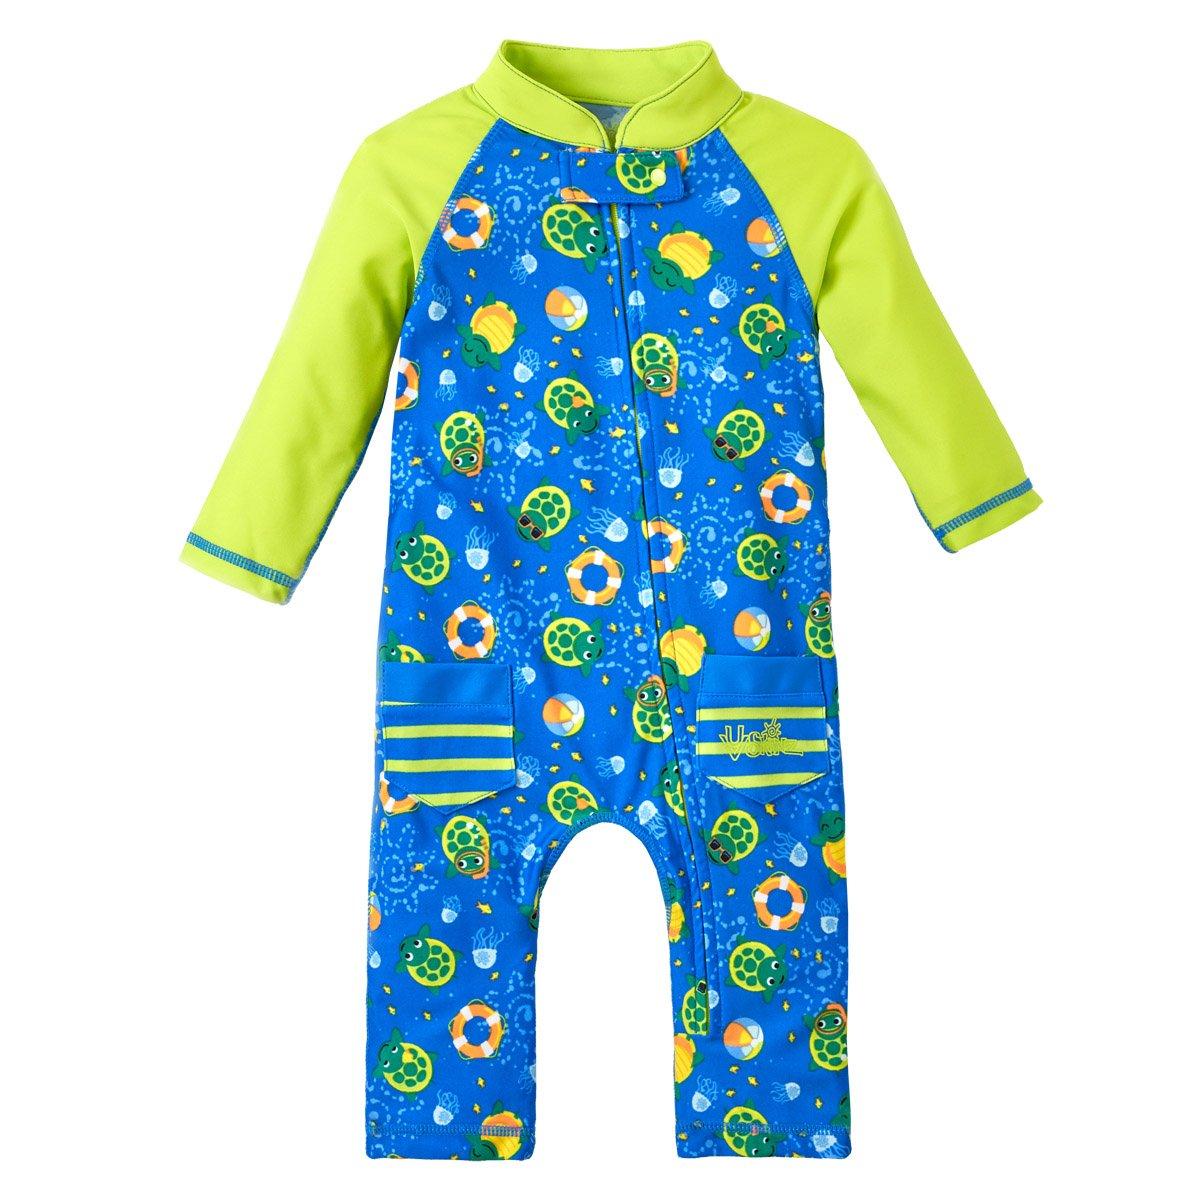 Body Sun//Swim Suit UV Skinz Baby Boys/' UPF 50 Kids/' Sun-Blocking Swimwear